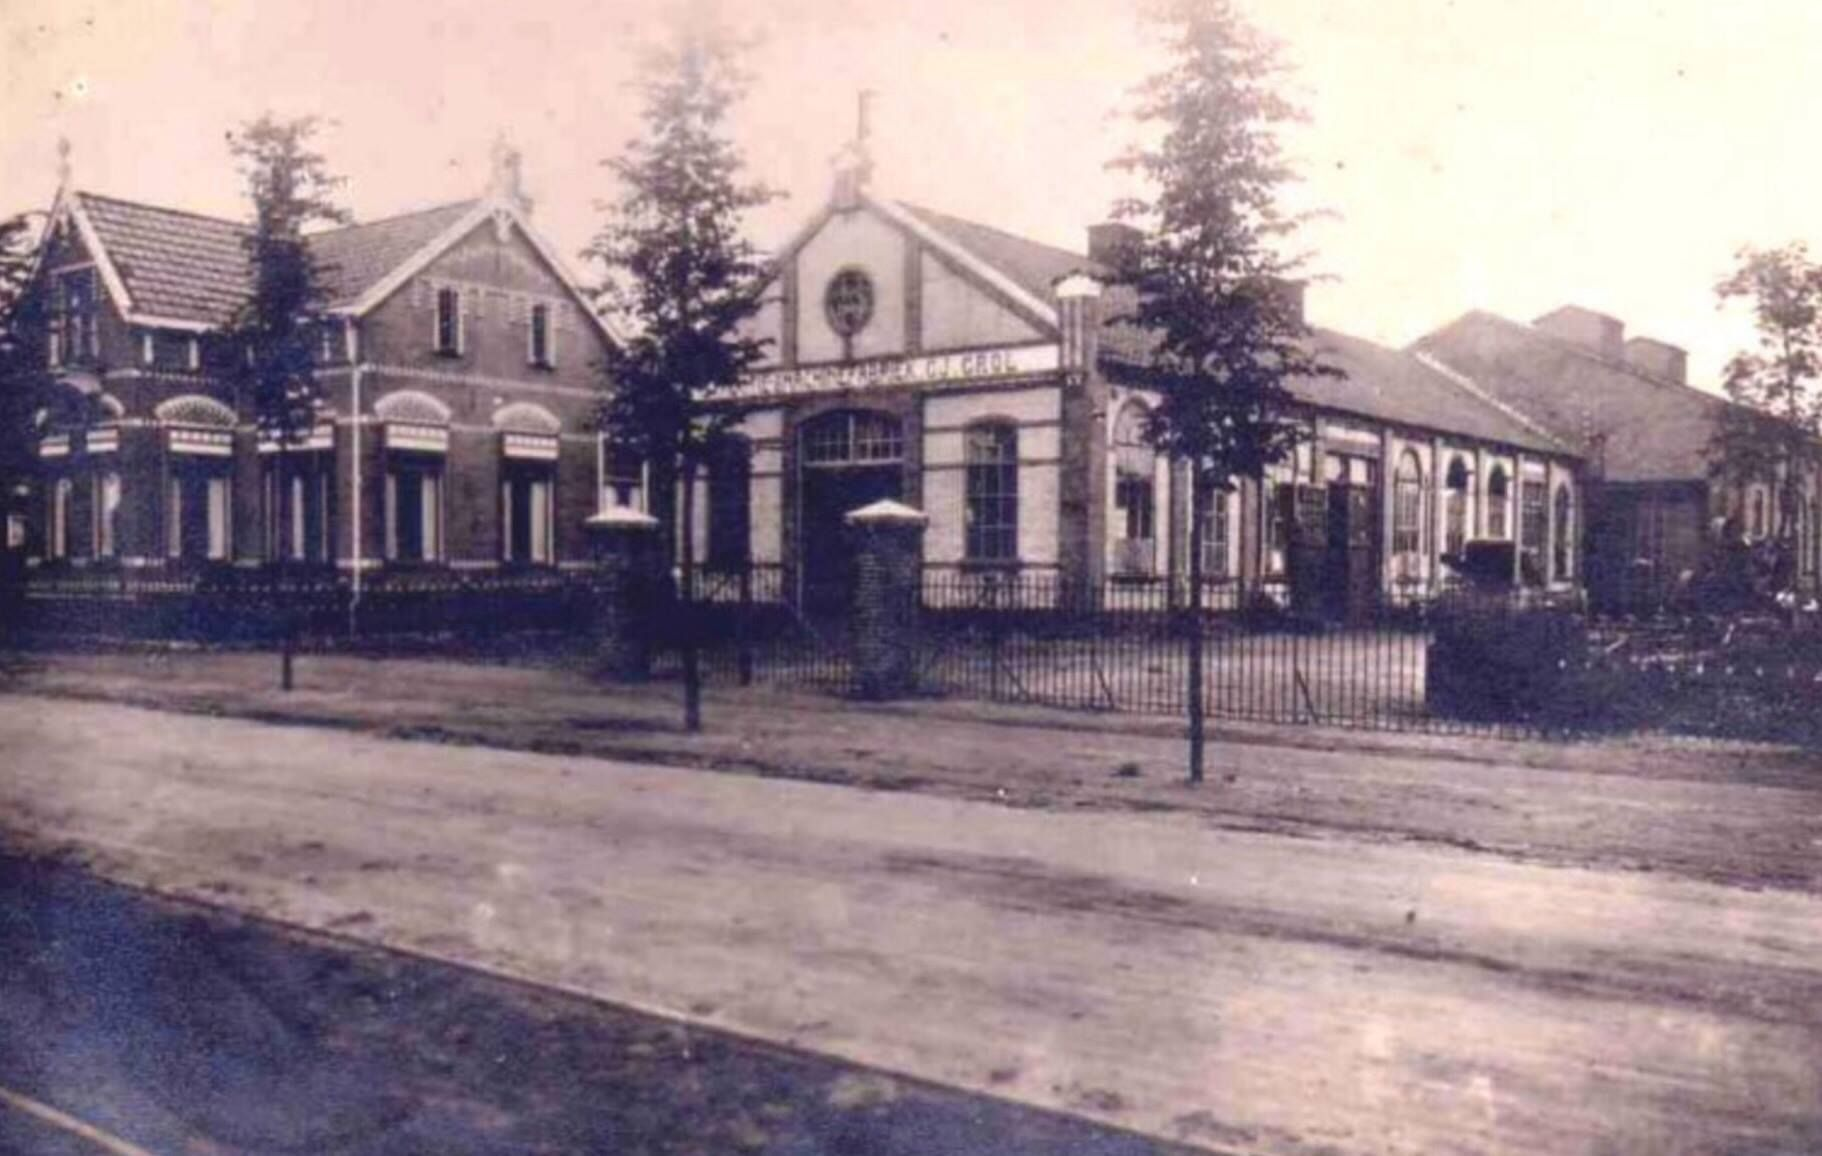 Semsstraat 26 Stadskanaal (1921)